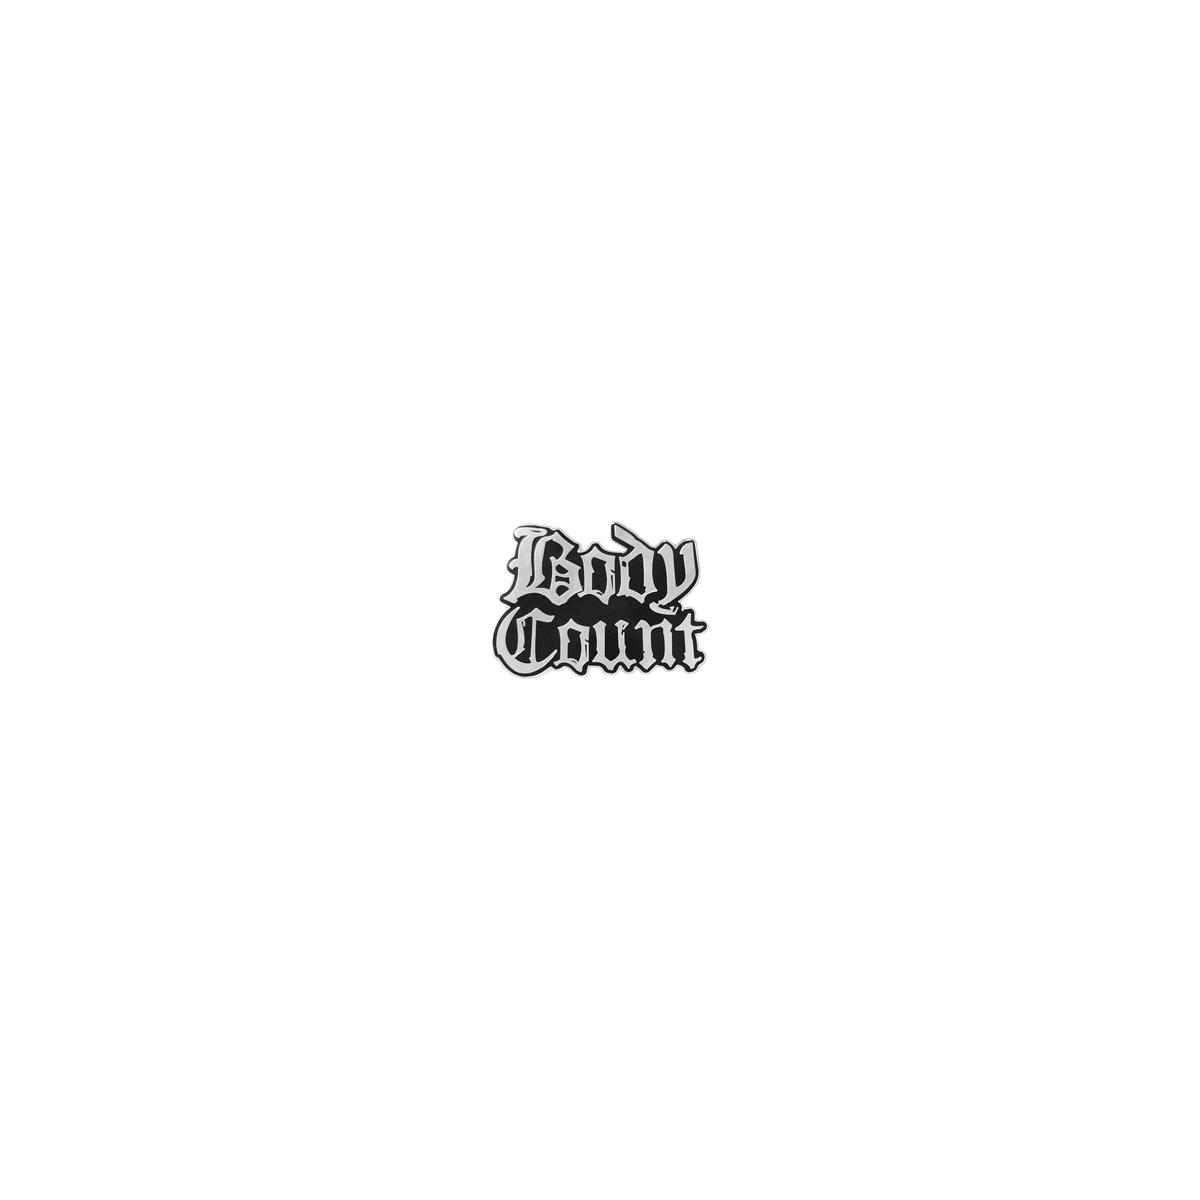 Body Count - Carnivore Hoodie + Blue LP